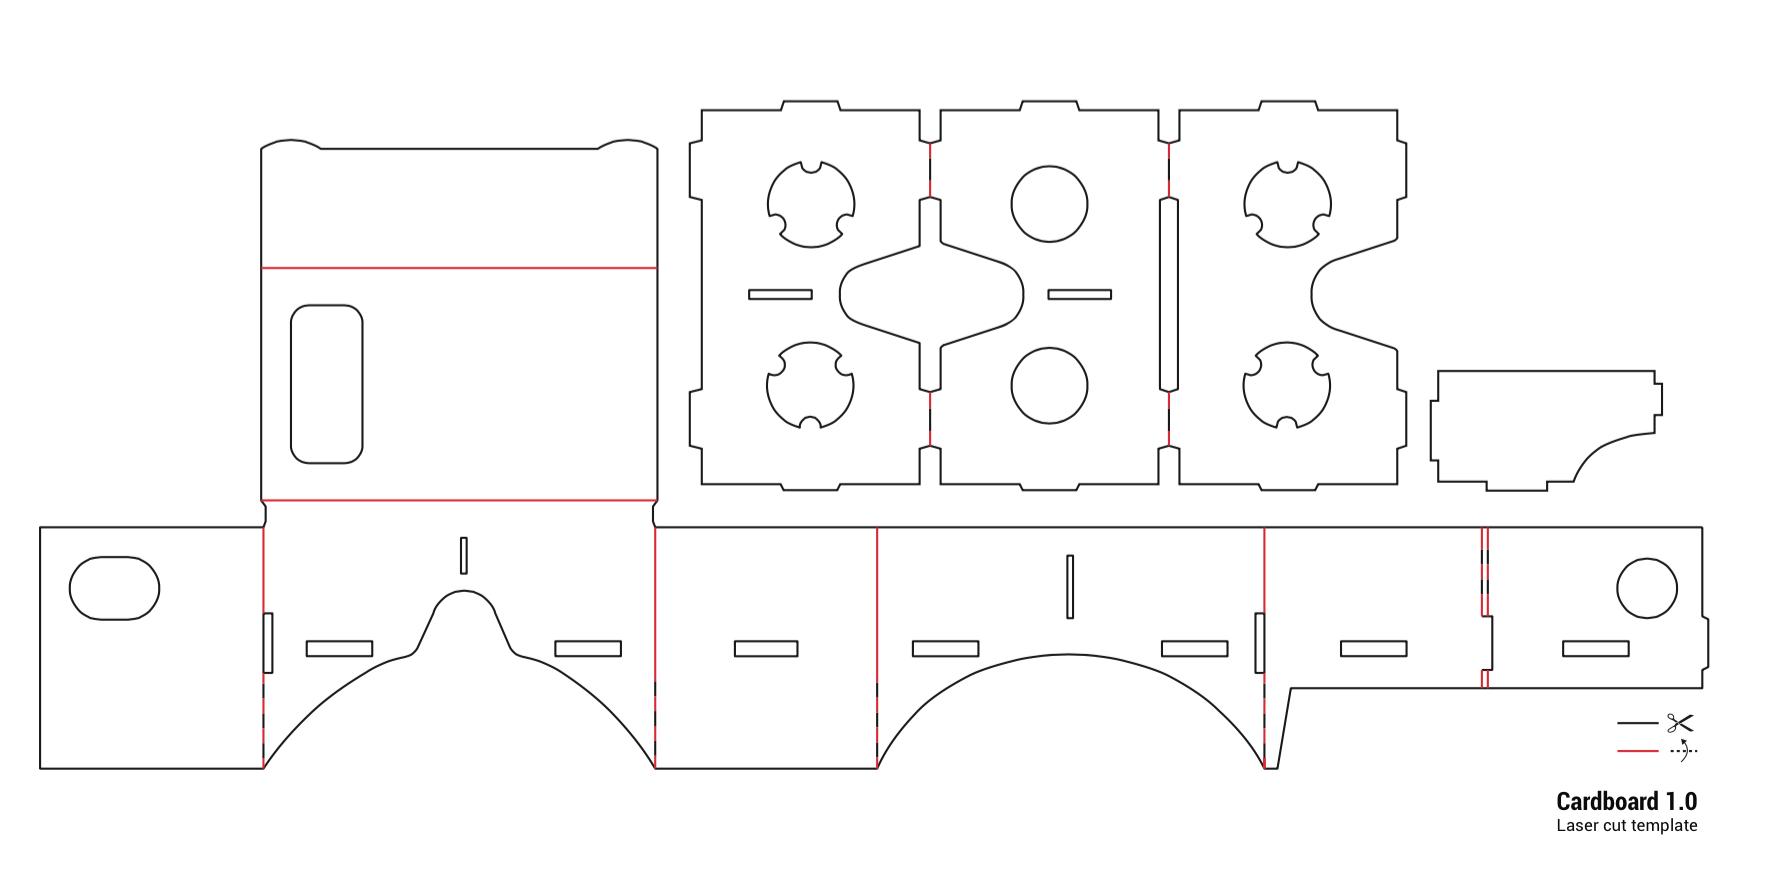 google cardboard template inspiration ideas free jpg download